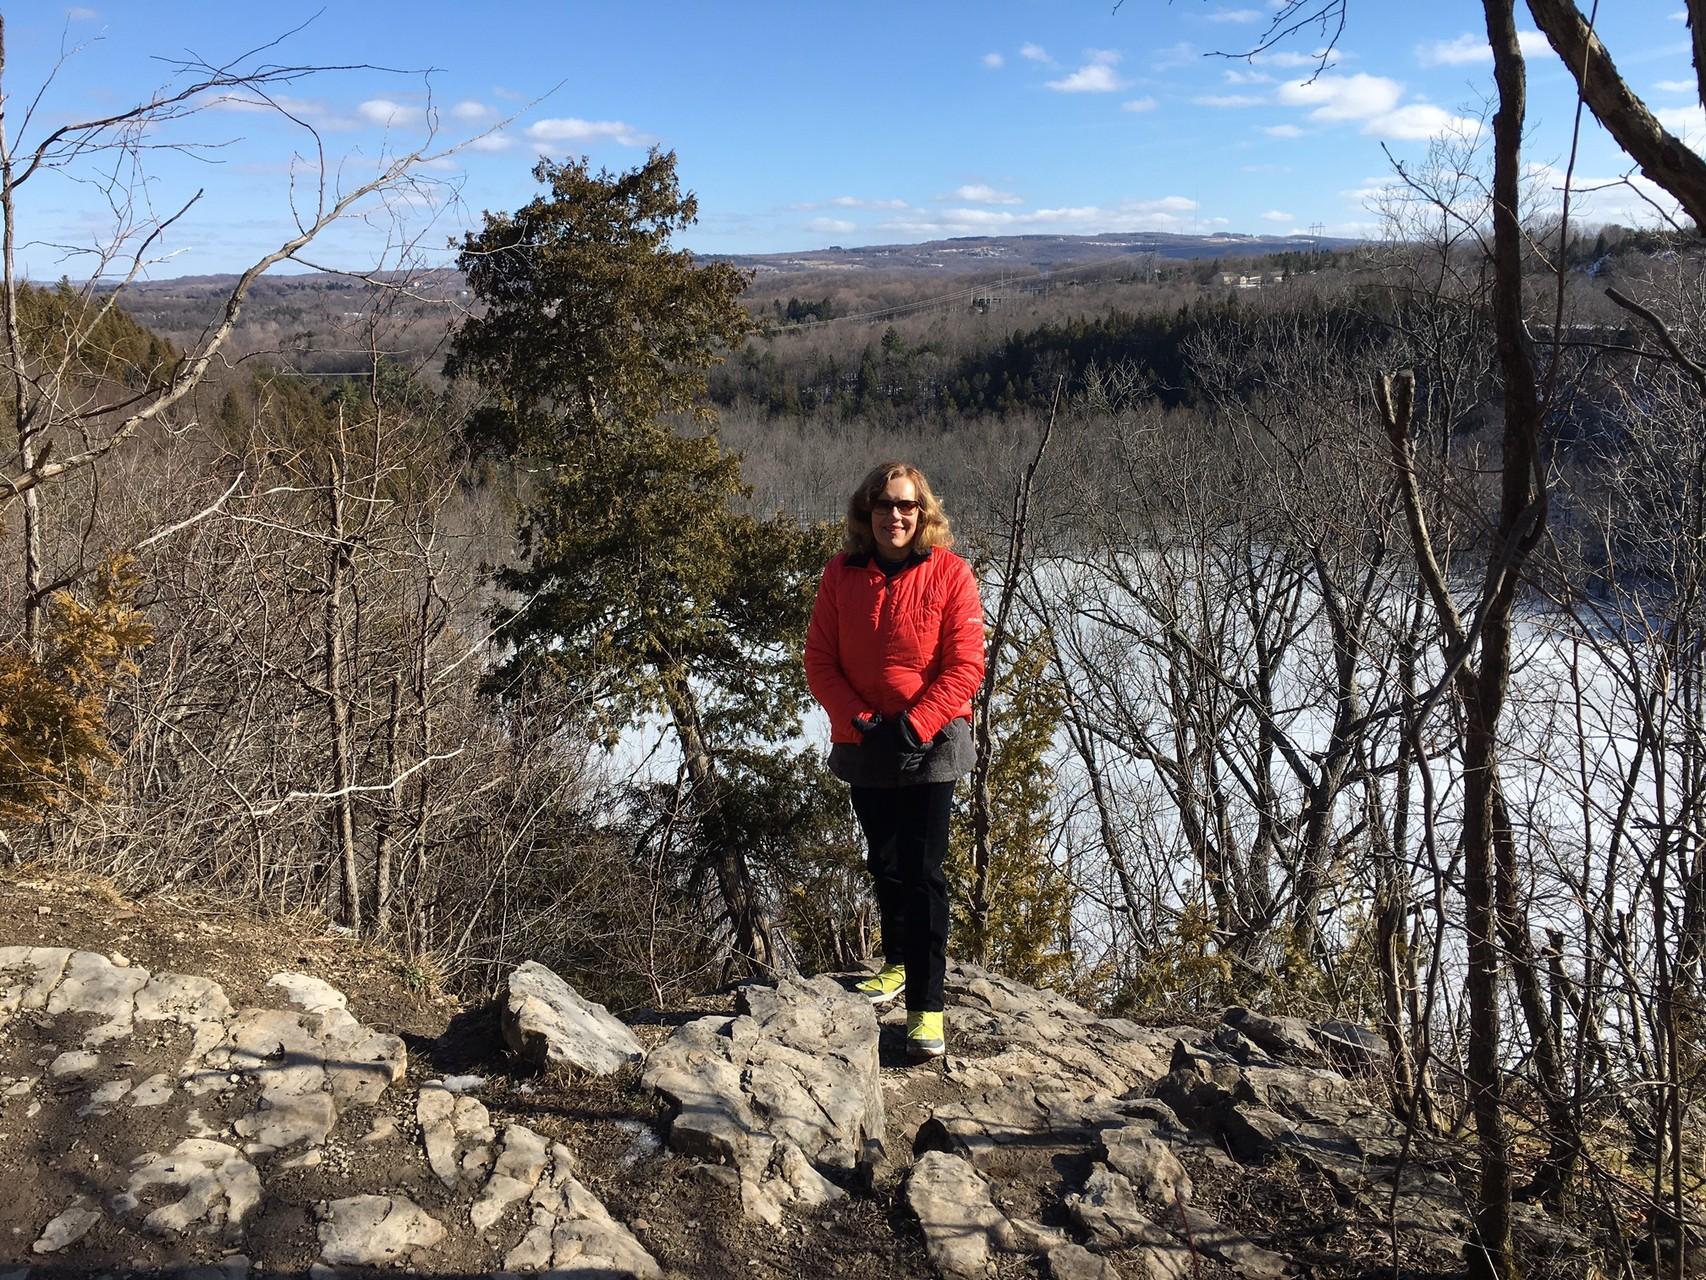 Lorraine at Clark Reservation, Jamesville NY